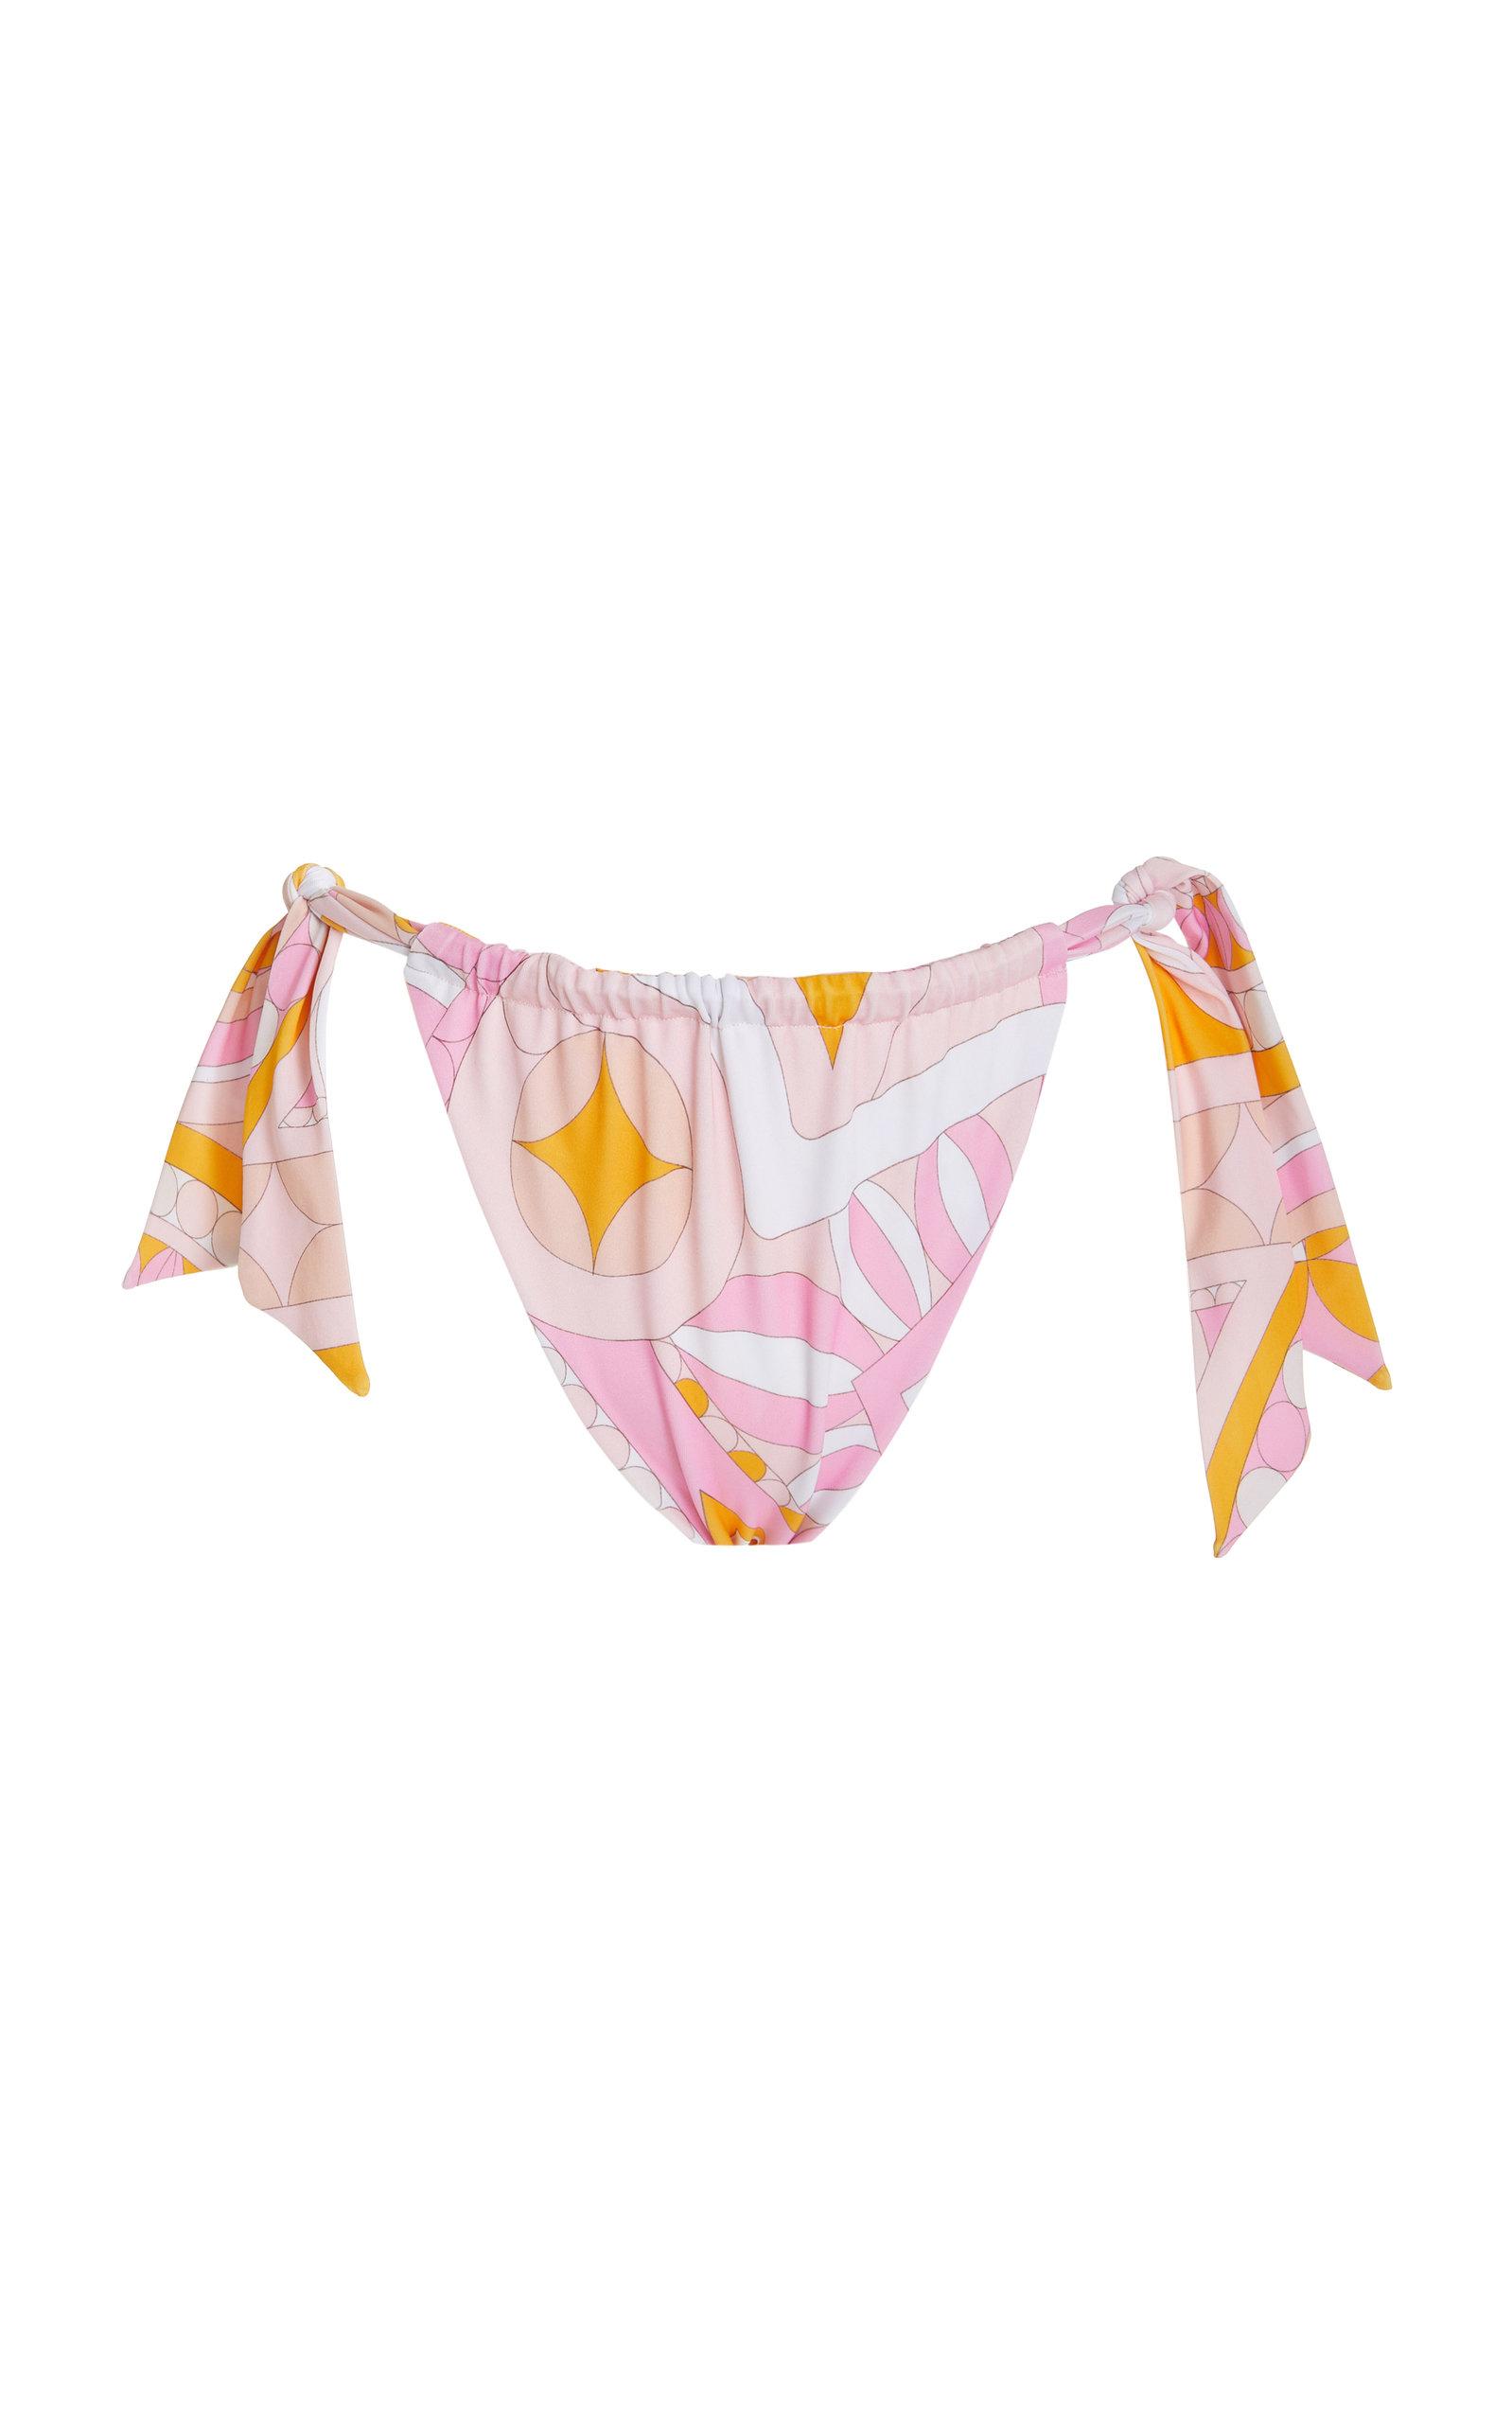 Cin Cin - Women's Mantra Tie-Detailed Printed Bikini Bottom - Print - Moda Operandi